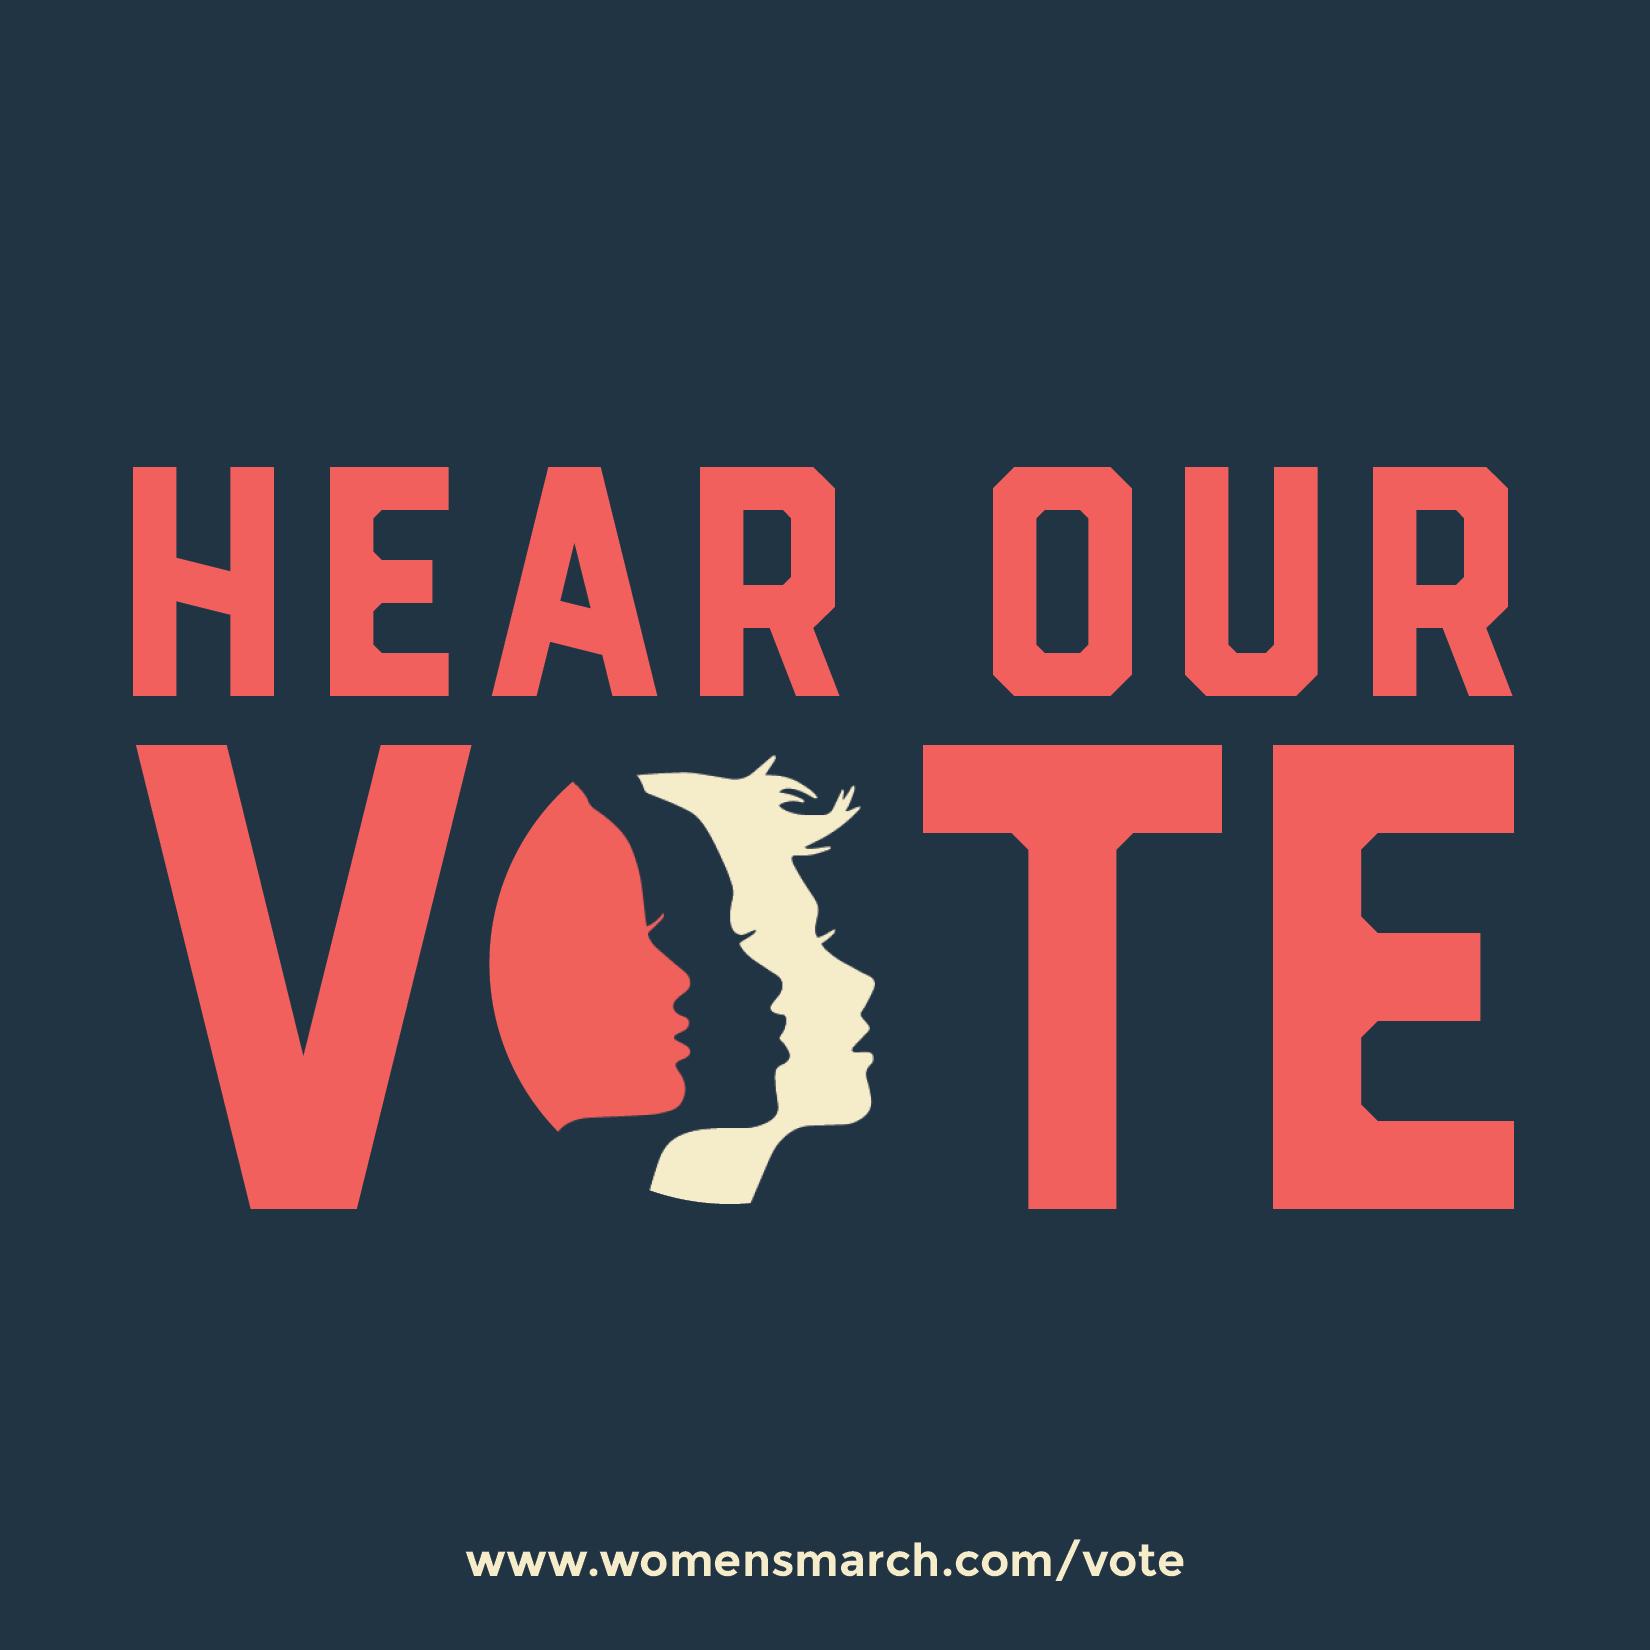 Hear_our_vote_logo